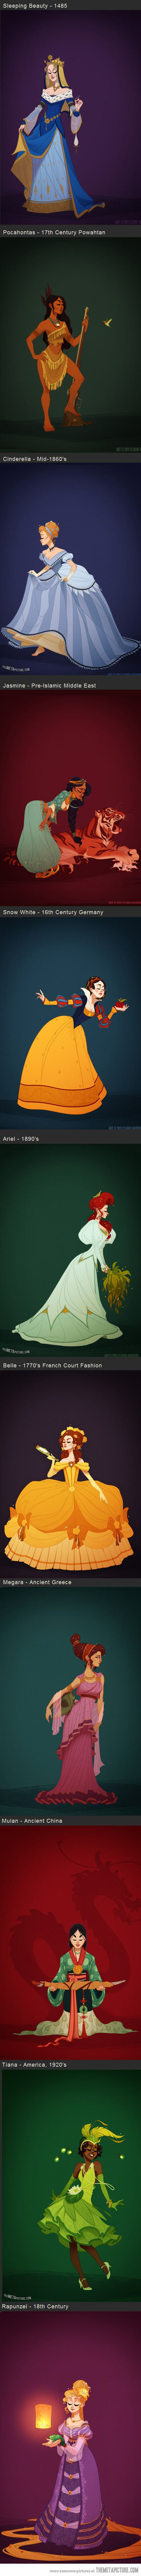 Disney Princesses in accurate period costume